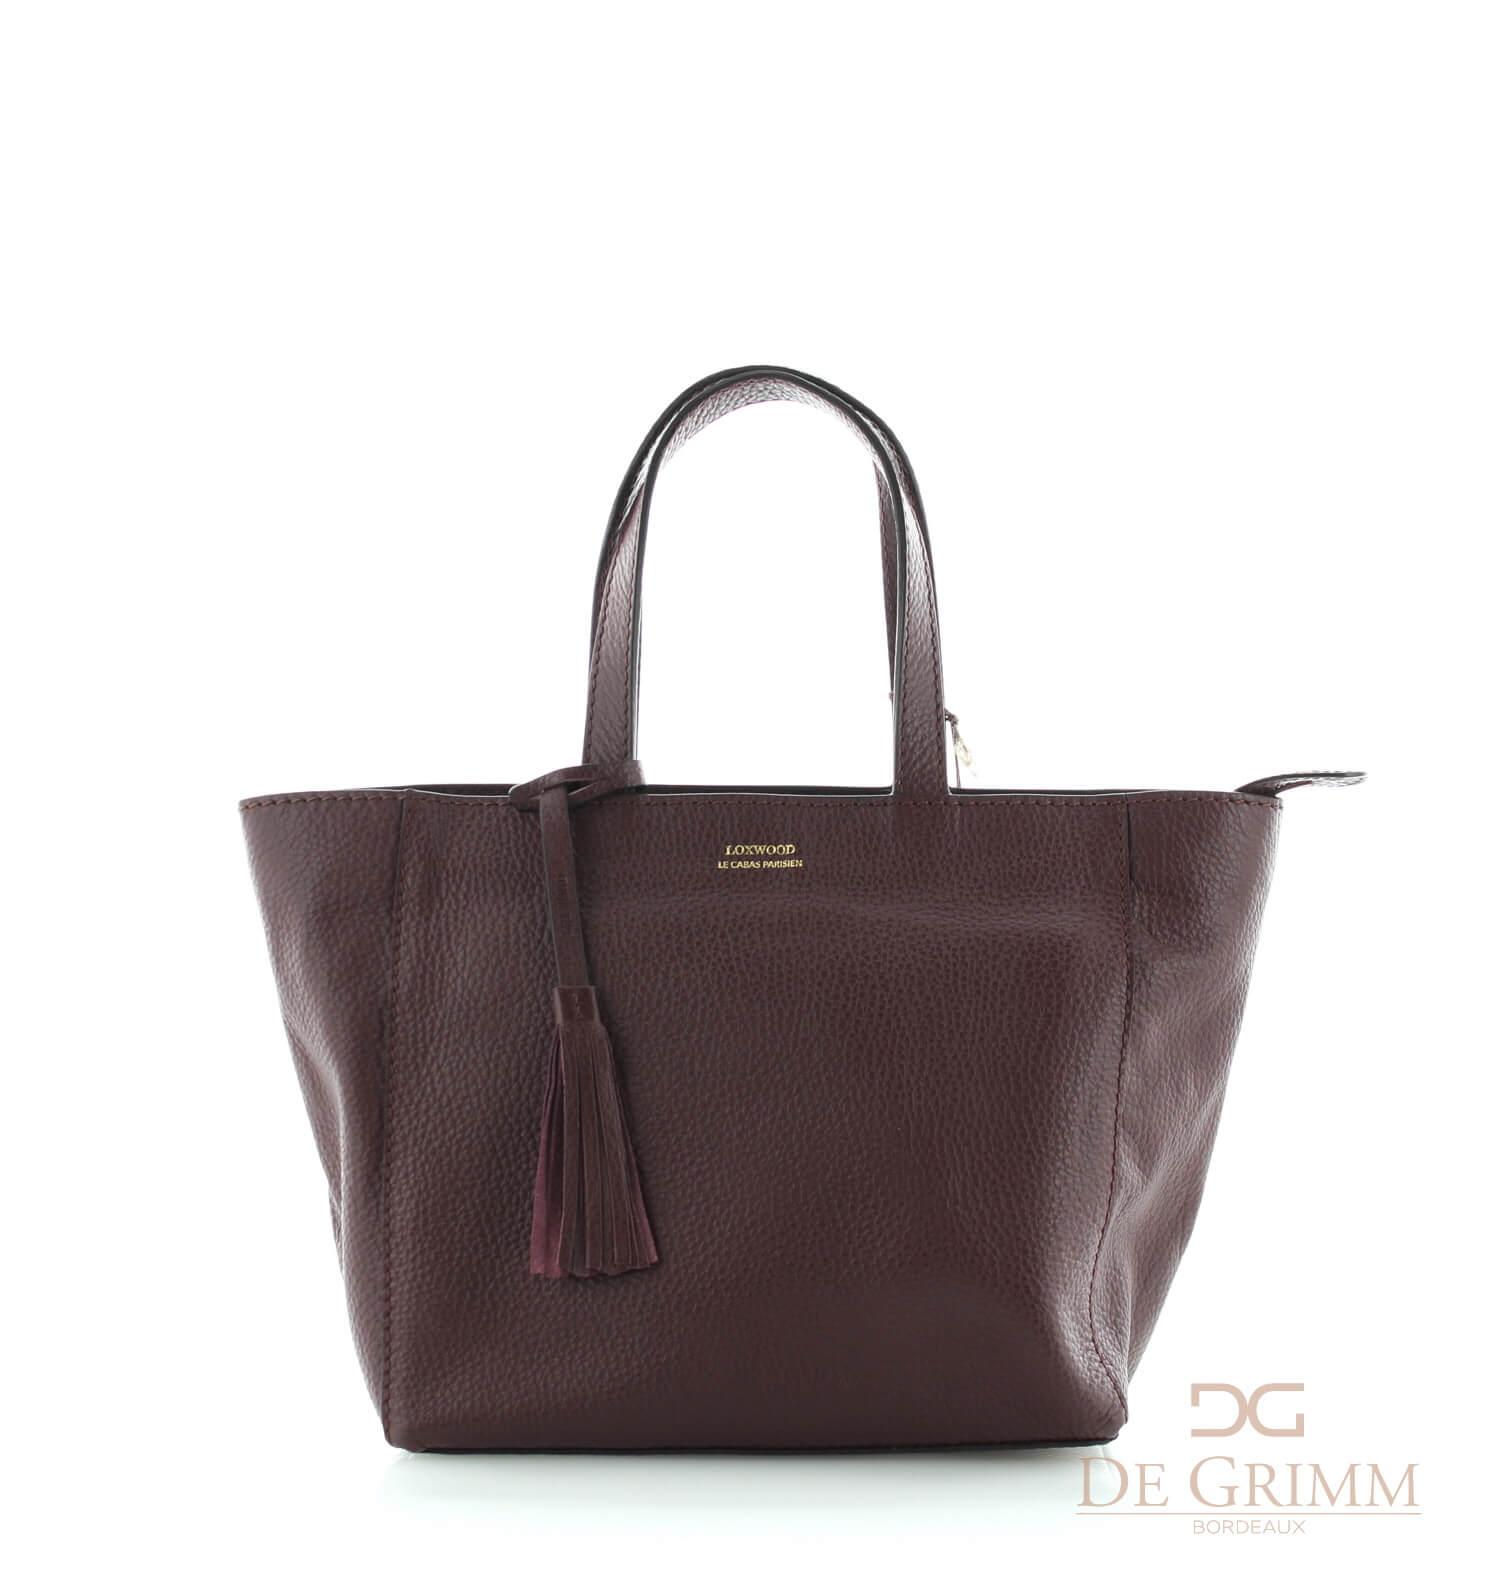 LOXWOOD Les parisiens Tote handbag 3164JP